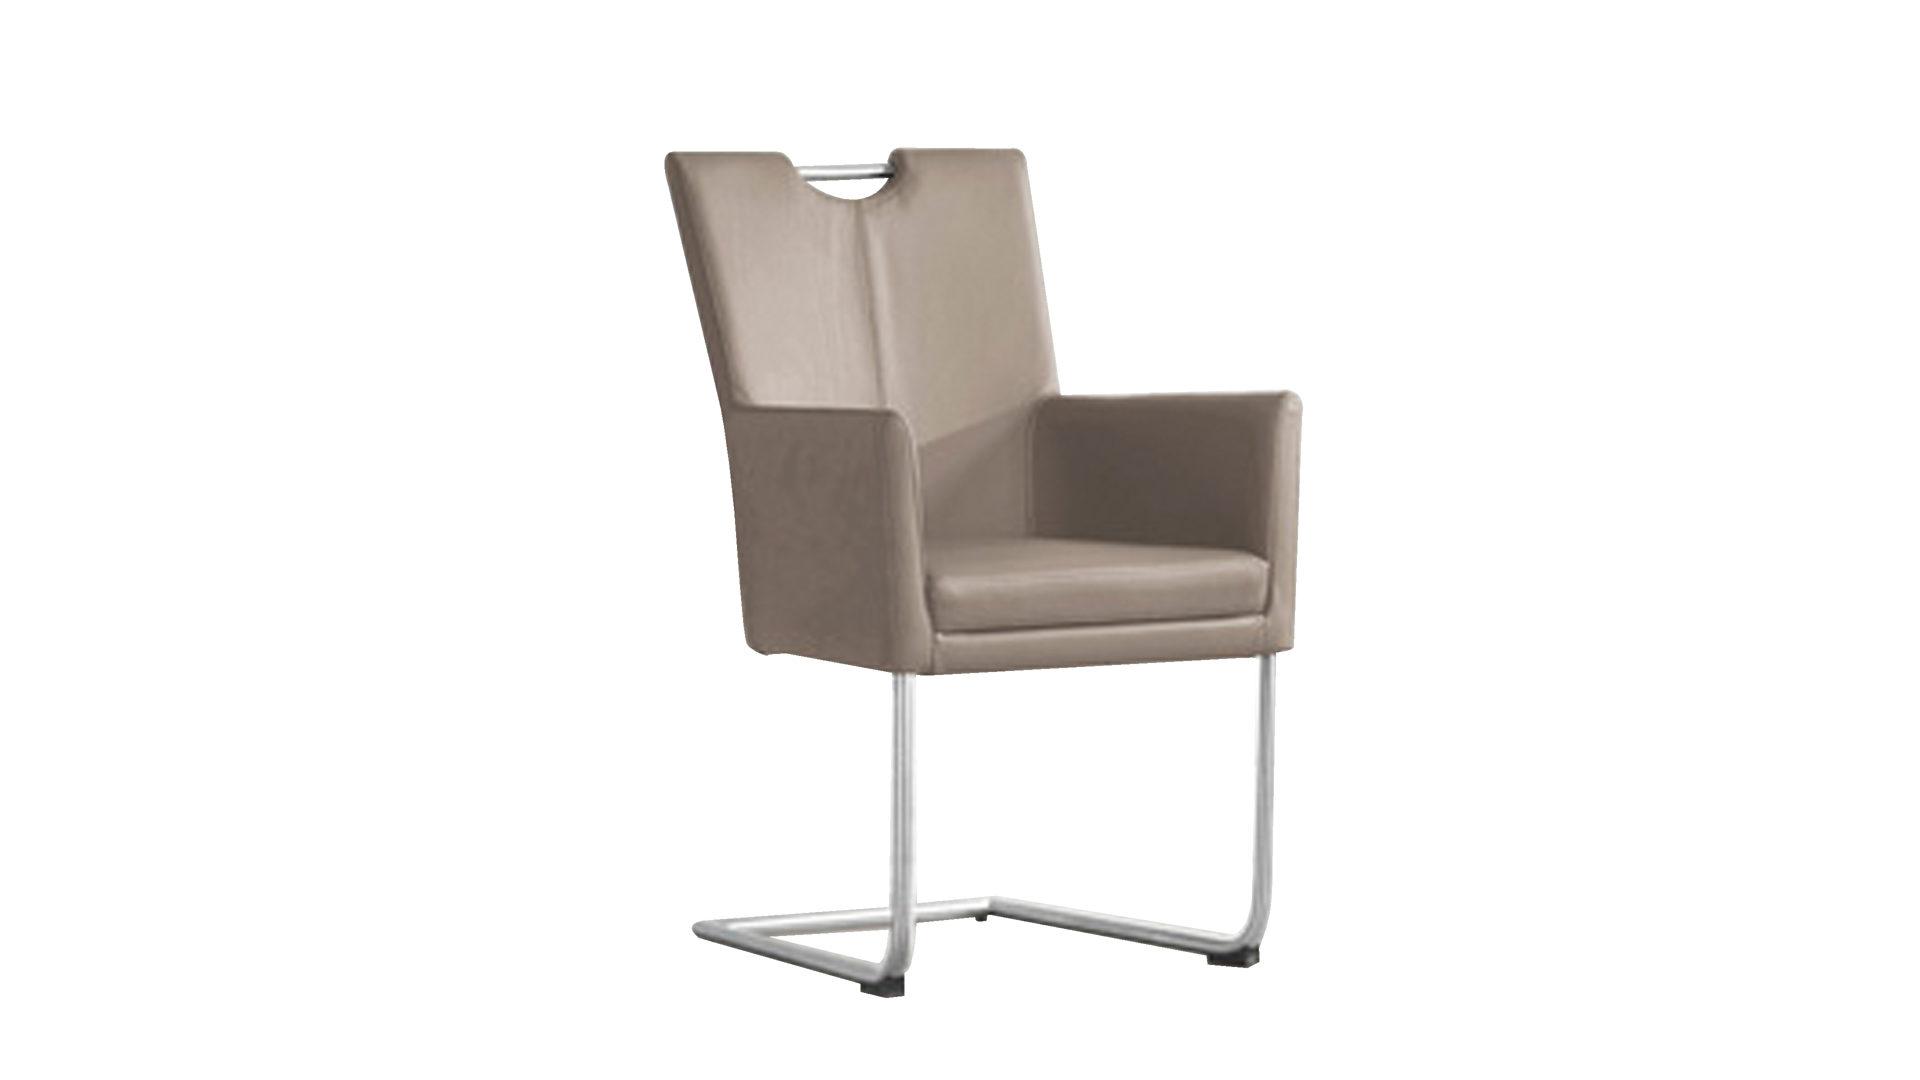 Schwingstuhl Weis Leder ~ Schwingstuhl ronja von vaja massivmöbel online kaufen